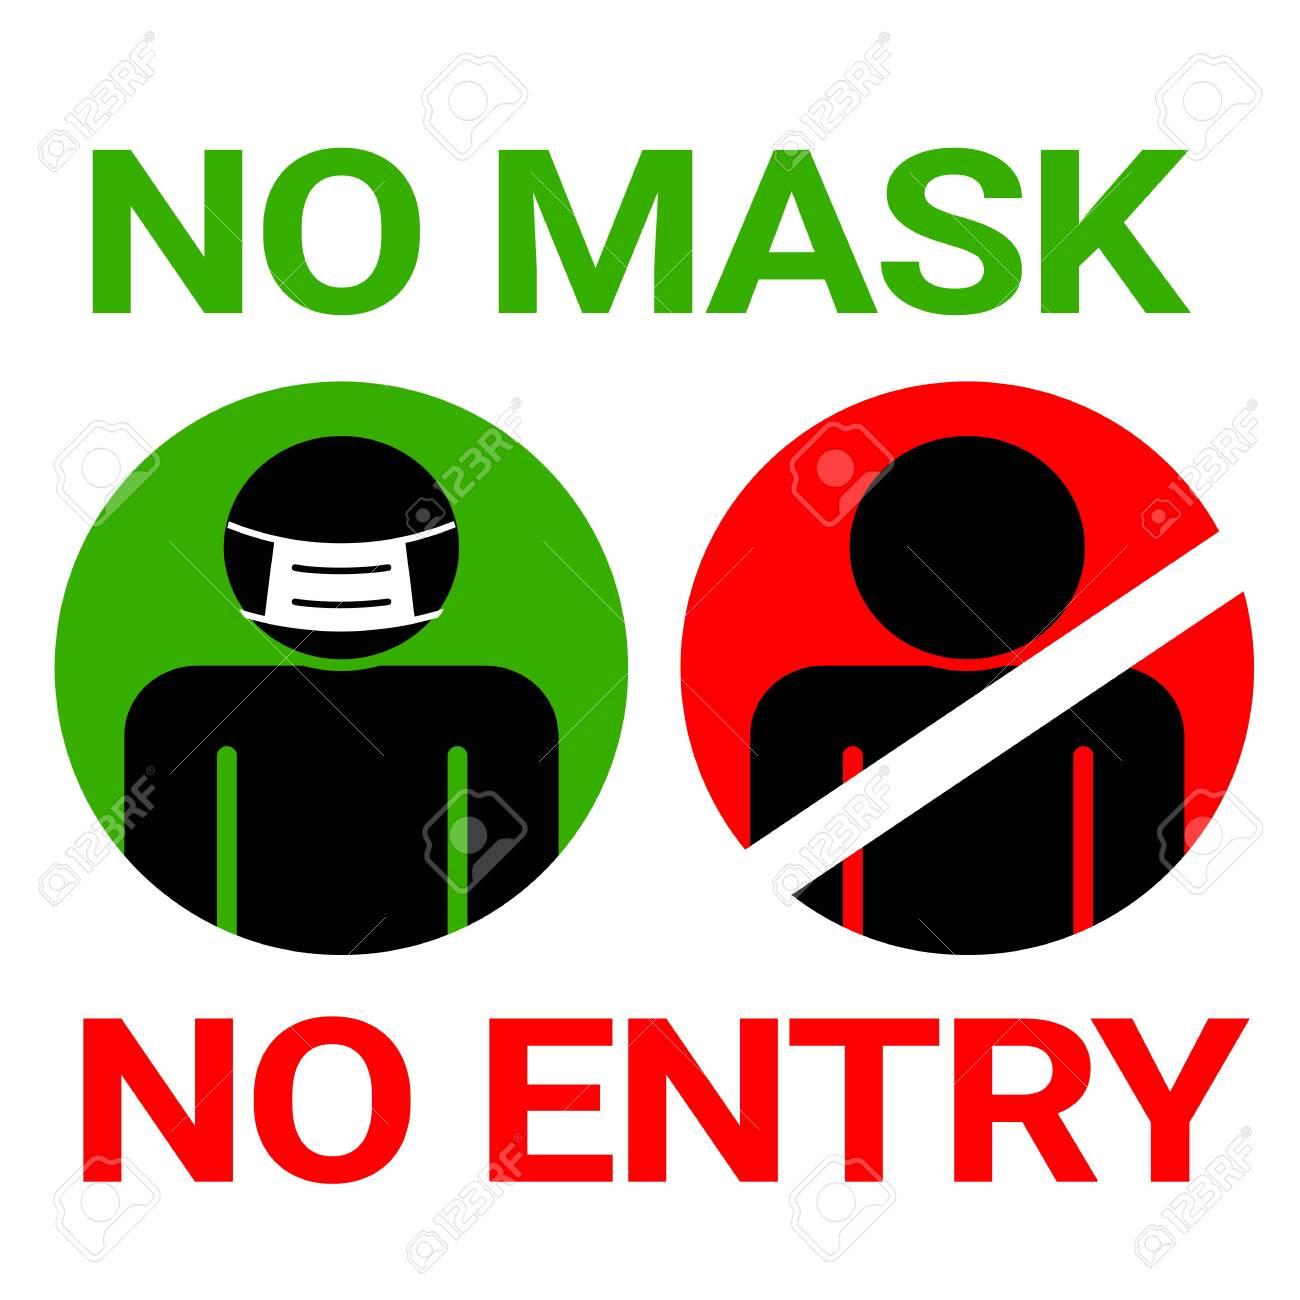 No mask no entry sign for Covid19 Corona  Virus protection concept